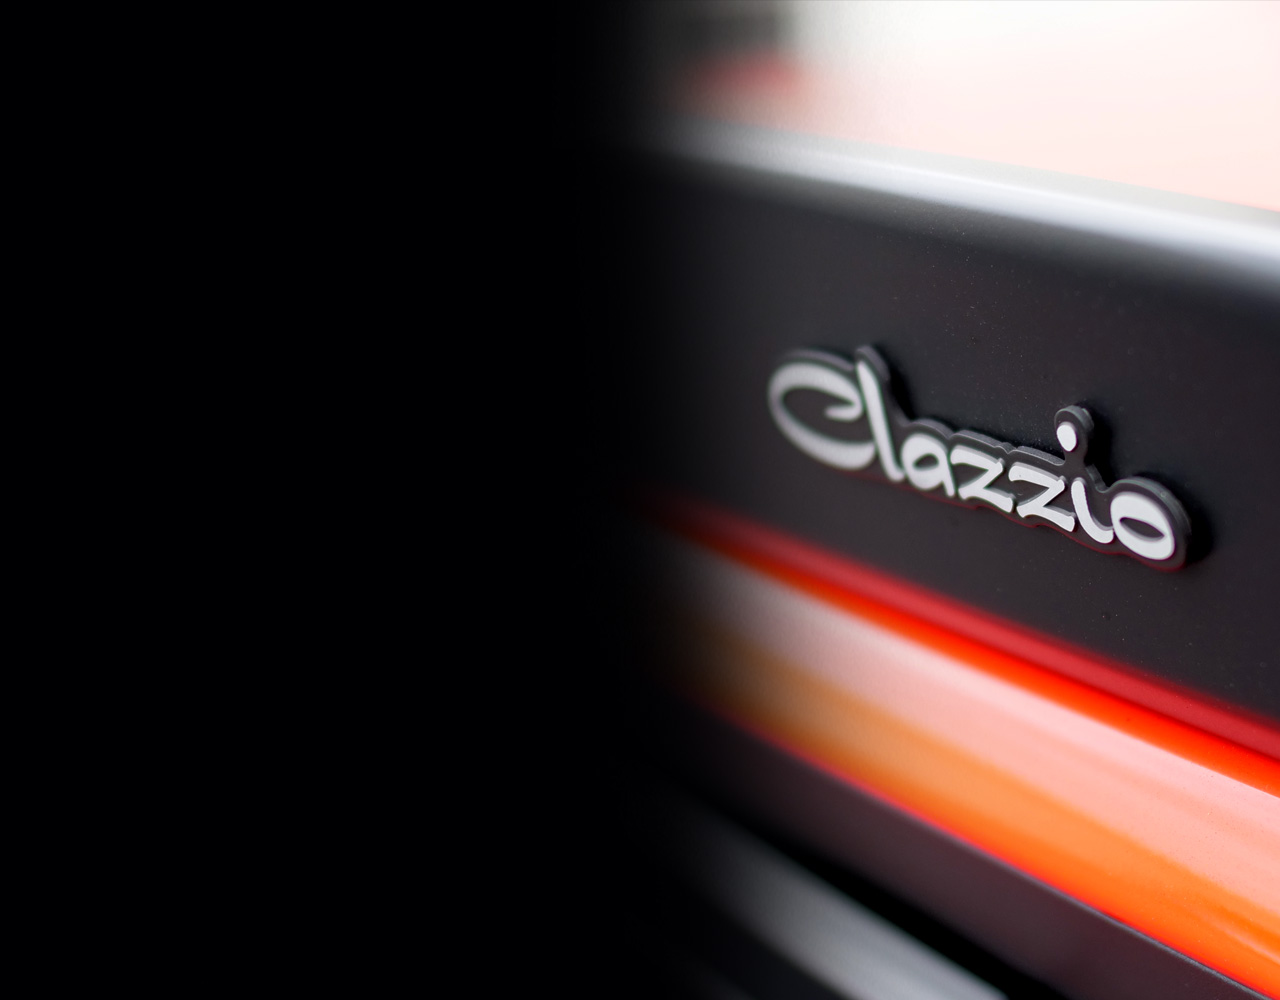 Contact Clazzio